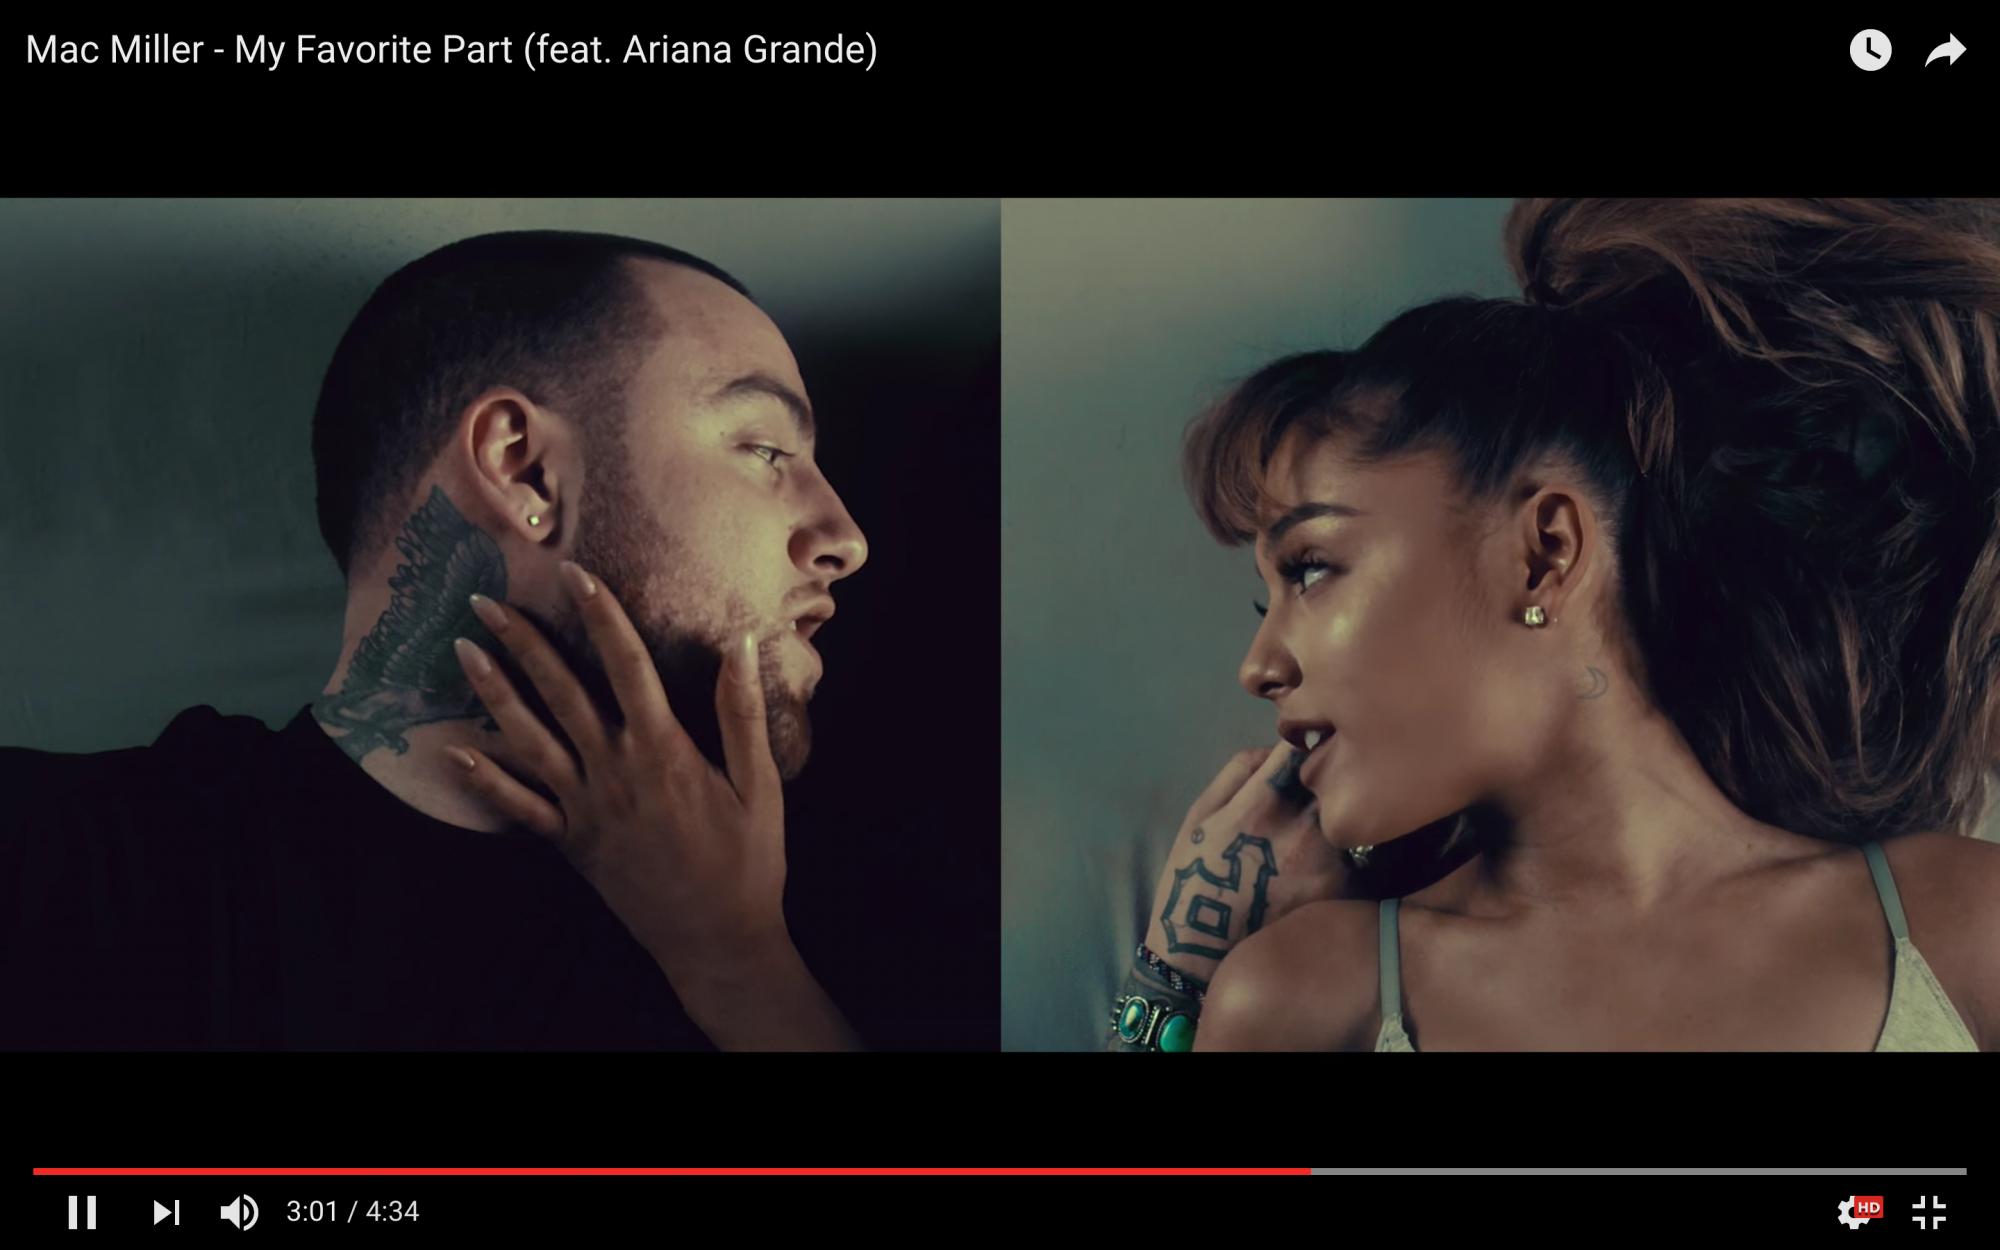 'My Favorite Part' video screengrab with Mac Miller, Ariana Grande (YouTube)